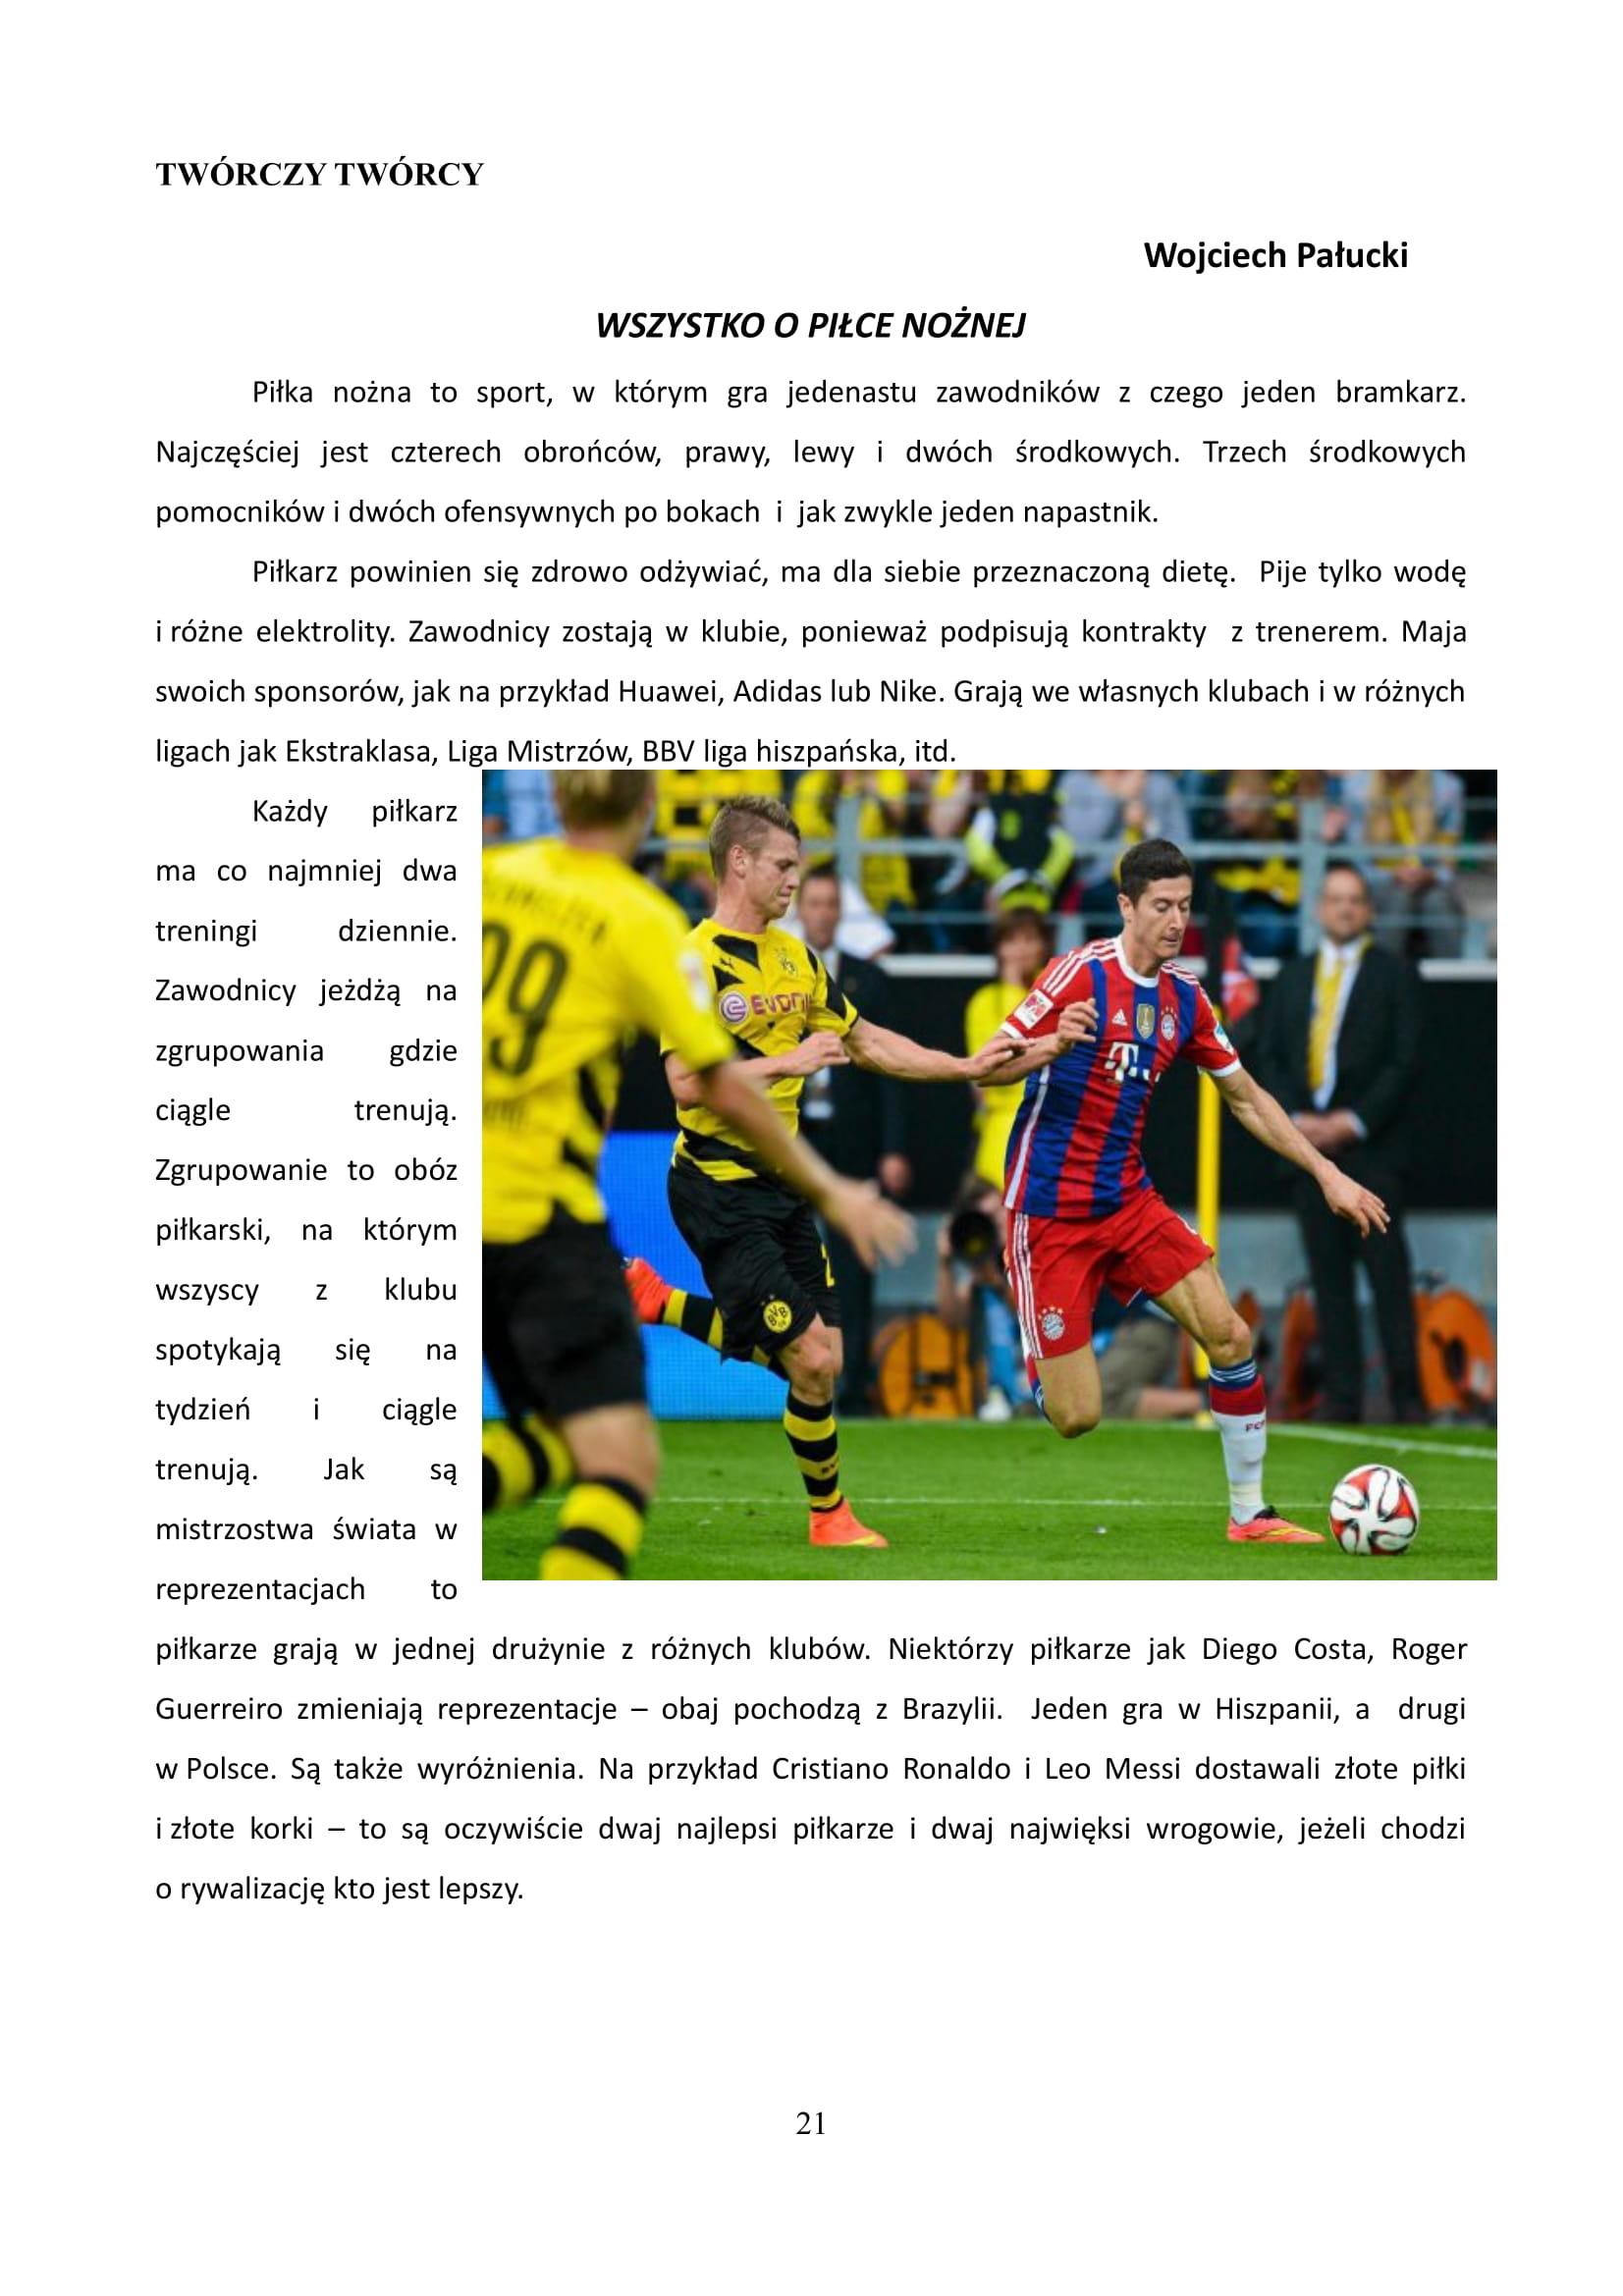 http://sp24sto.edu.pl/wp-content/uploads/sites/3/2018/02/Gazeta-4-2016.2017-21.jpg